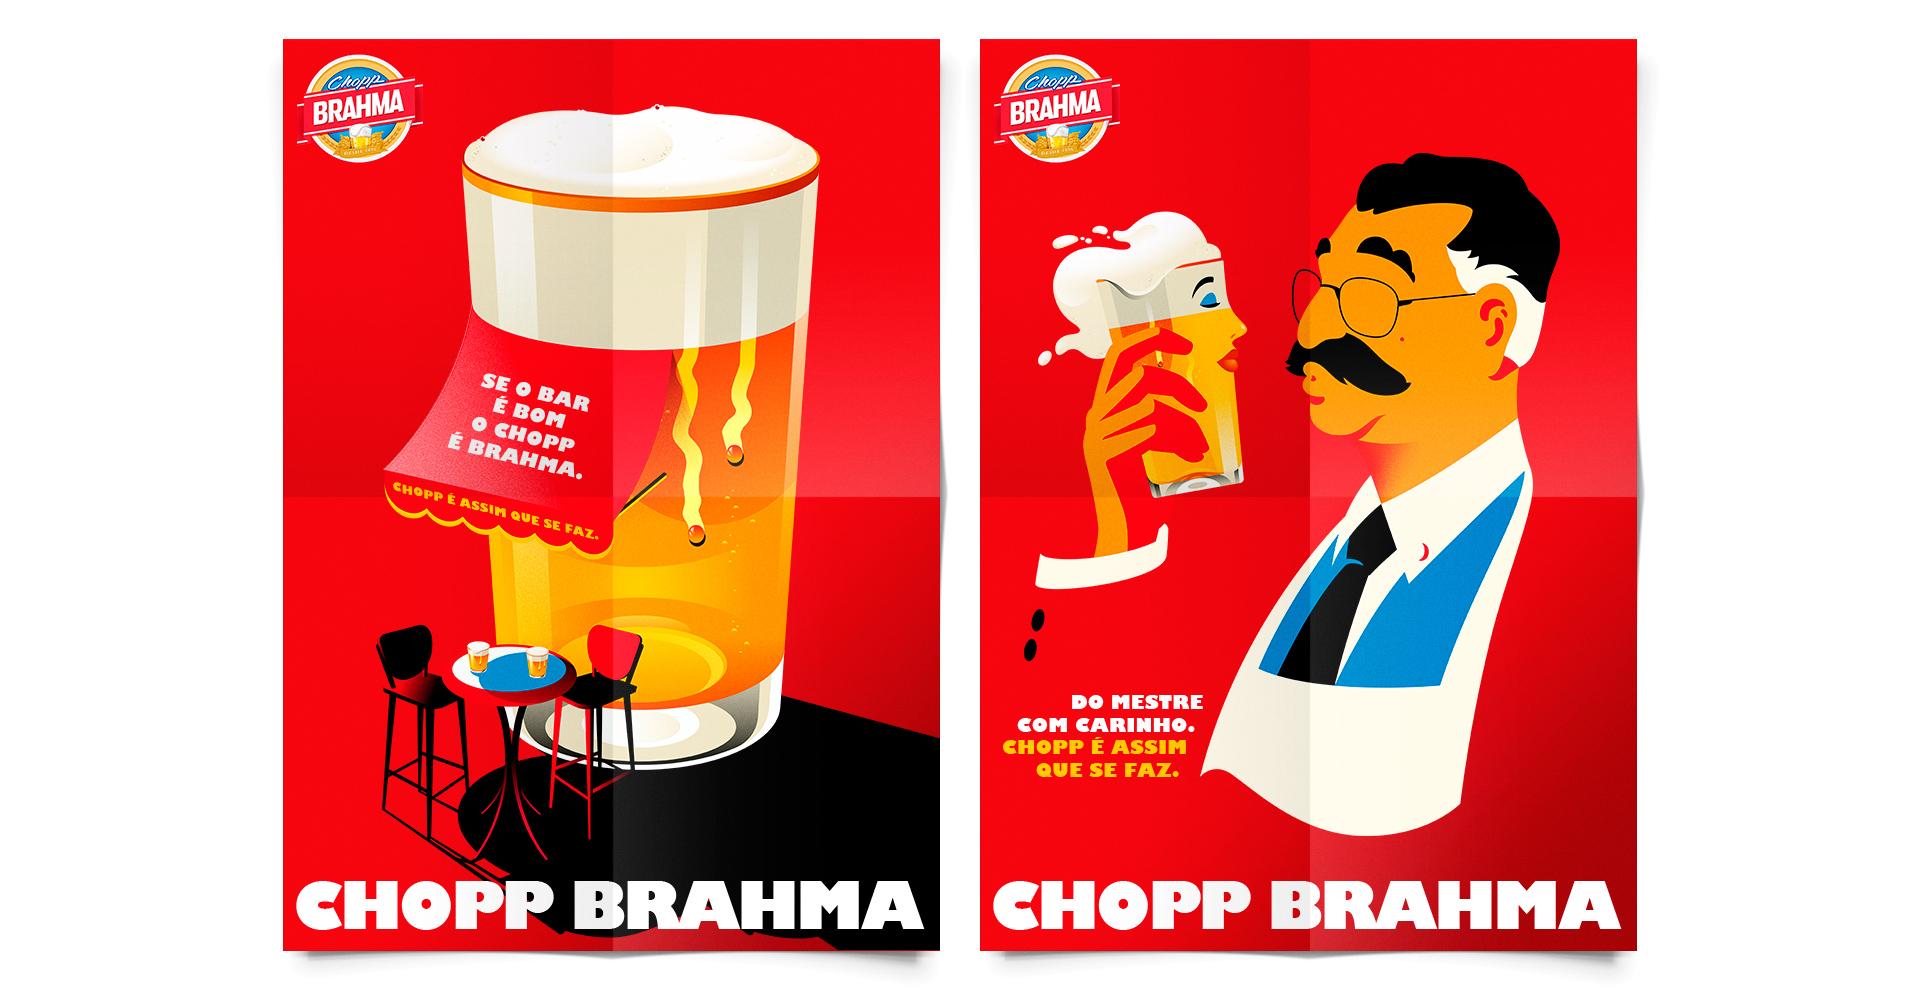 firmorama_chopp-brahma_05